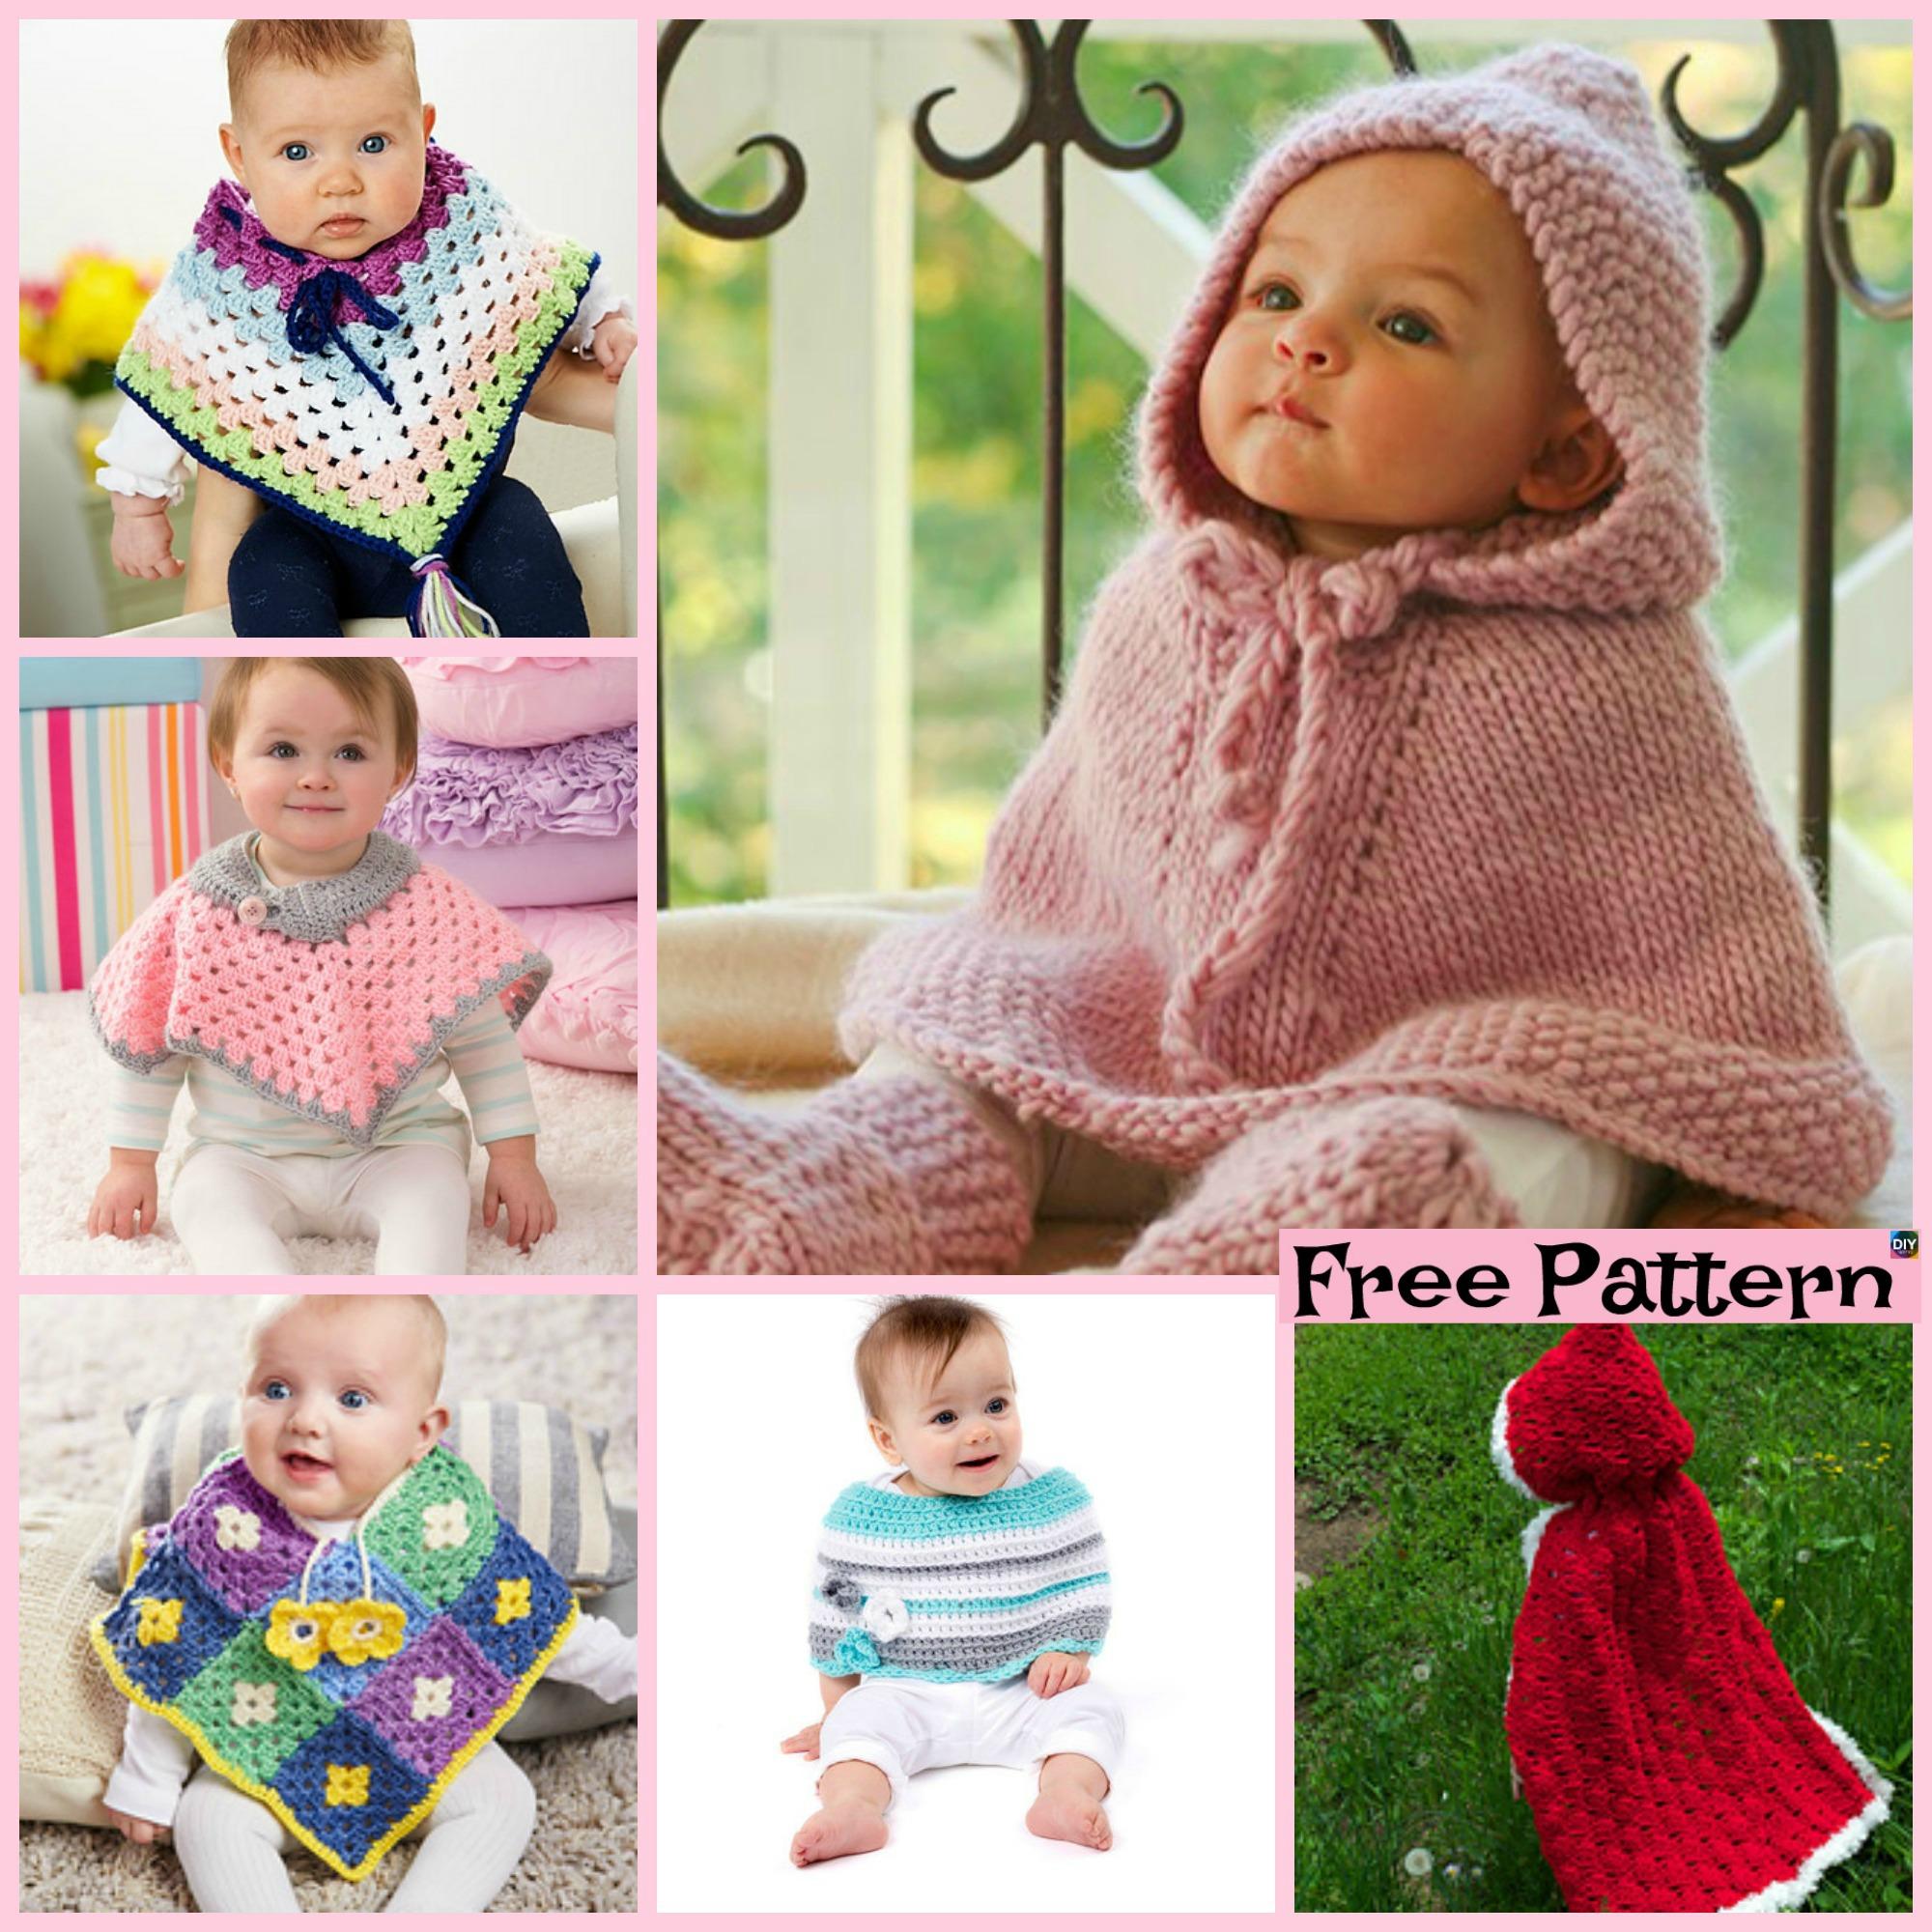 Crochet Baby Poncho - Free Pattern